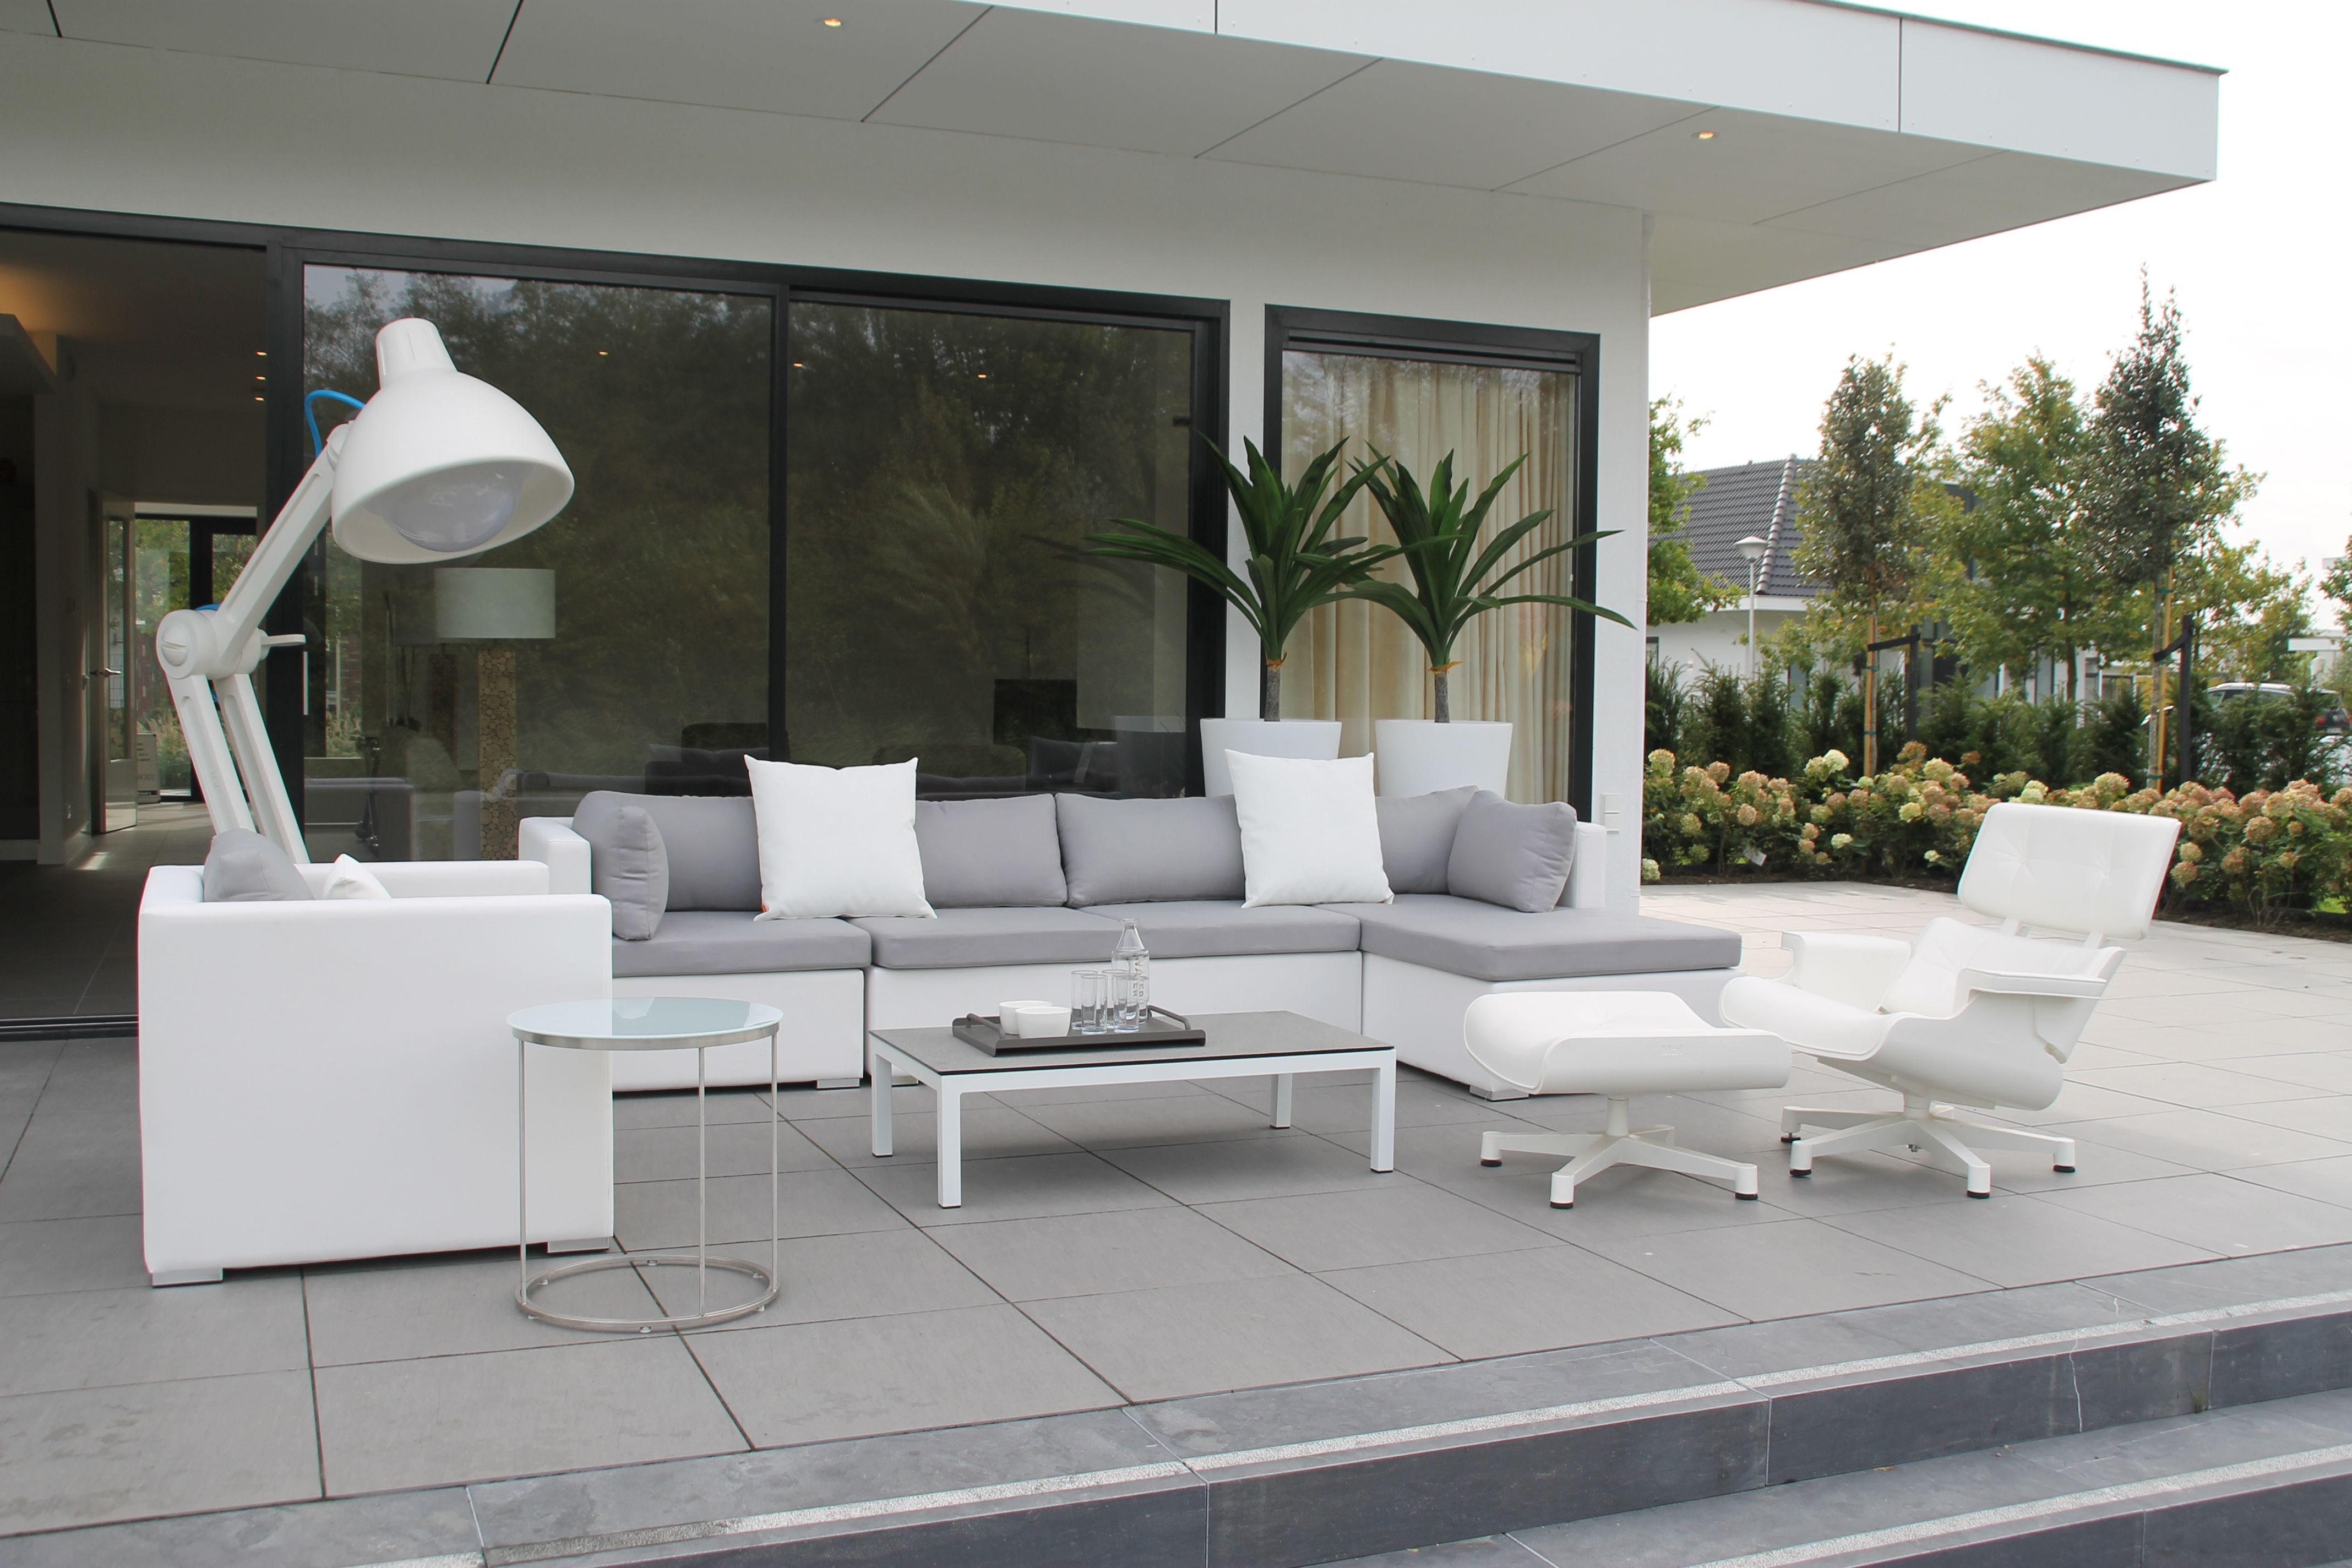 Tuinset tuinmeubelen lounge loungeset white grey wit grijs